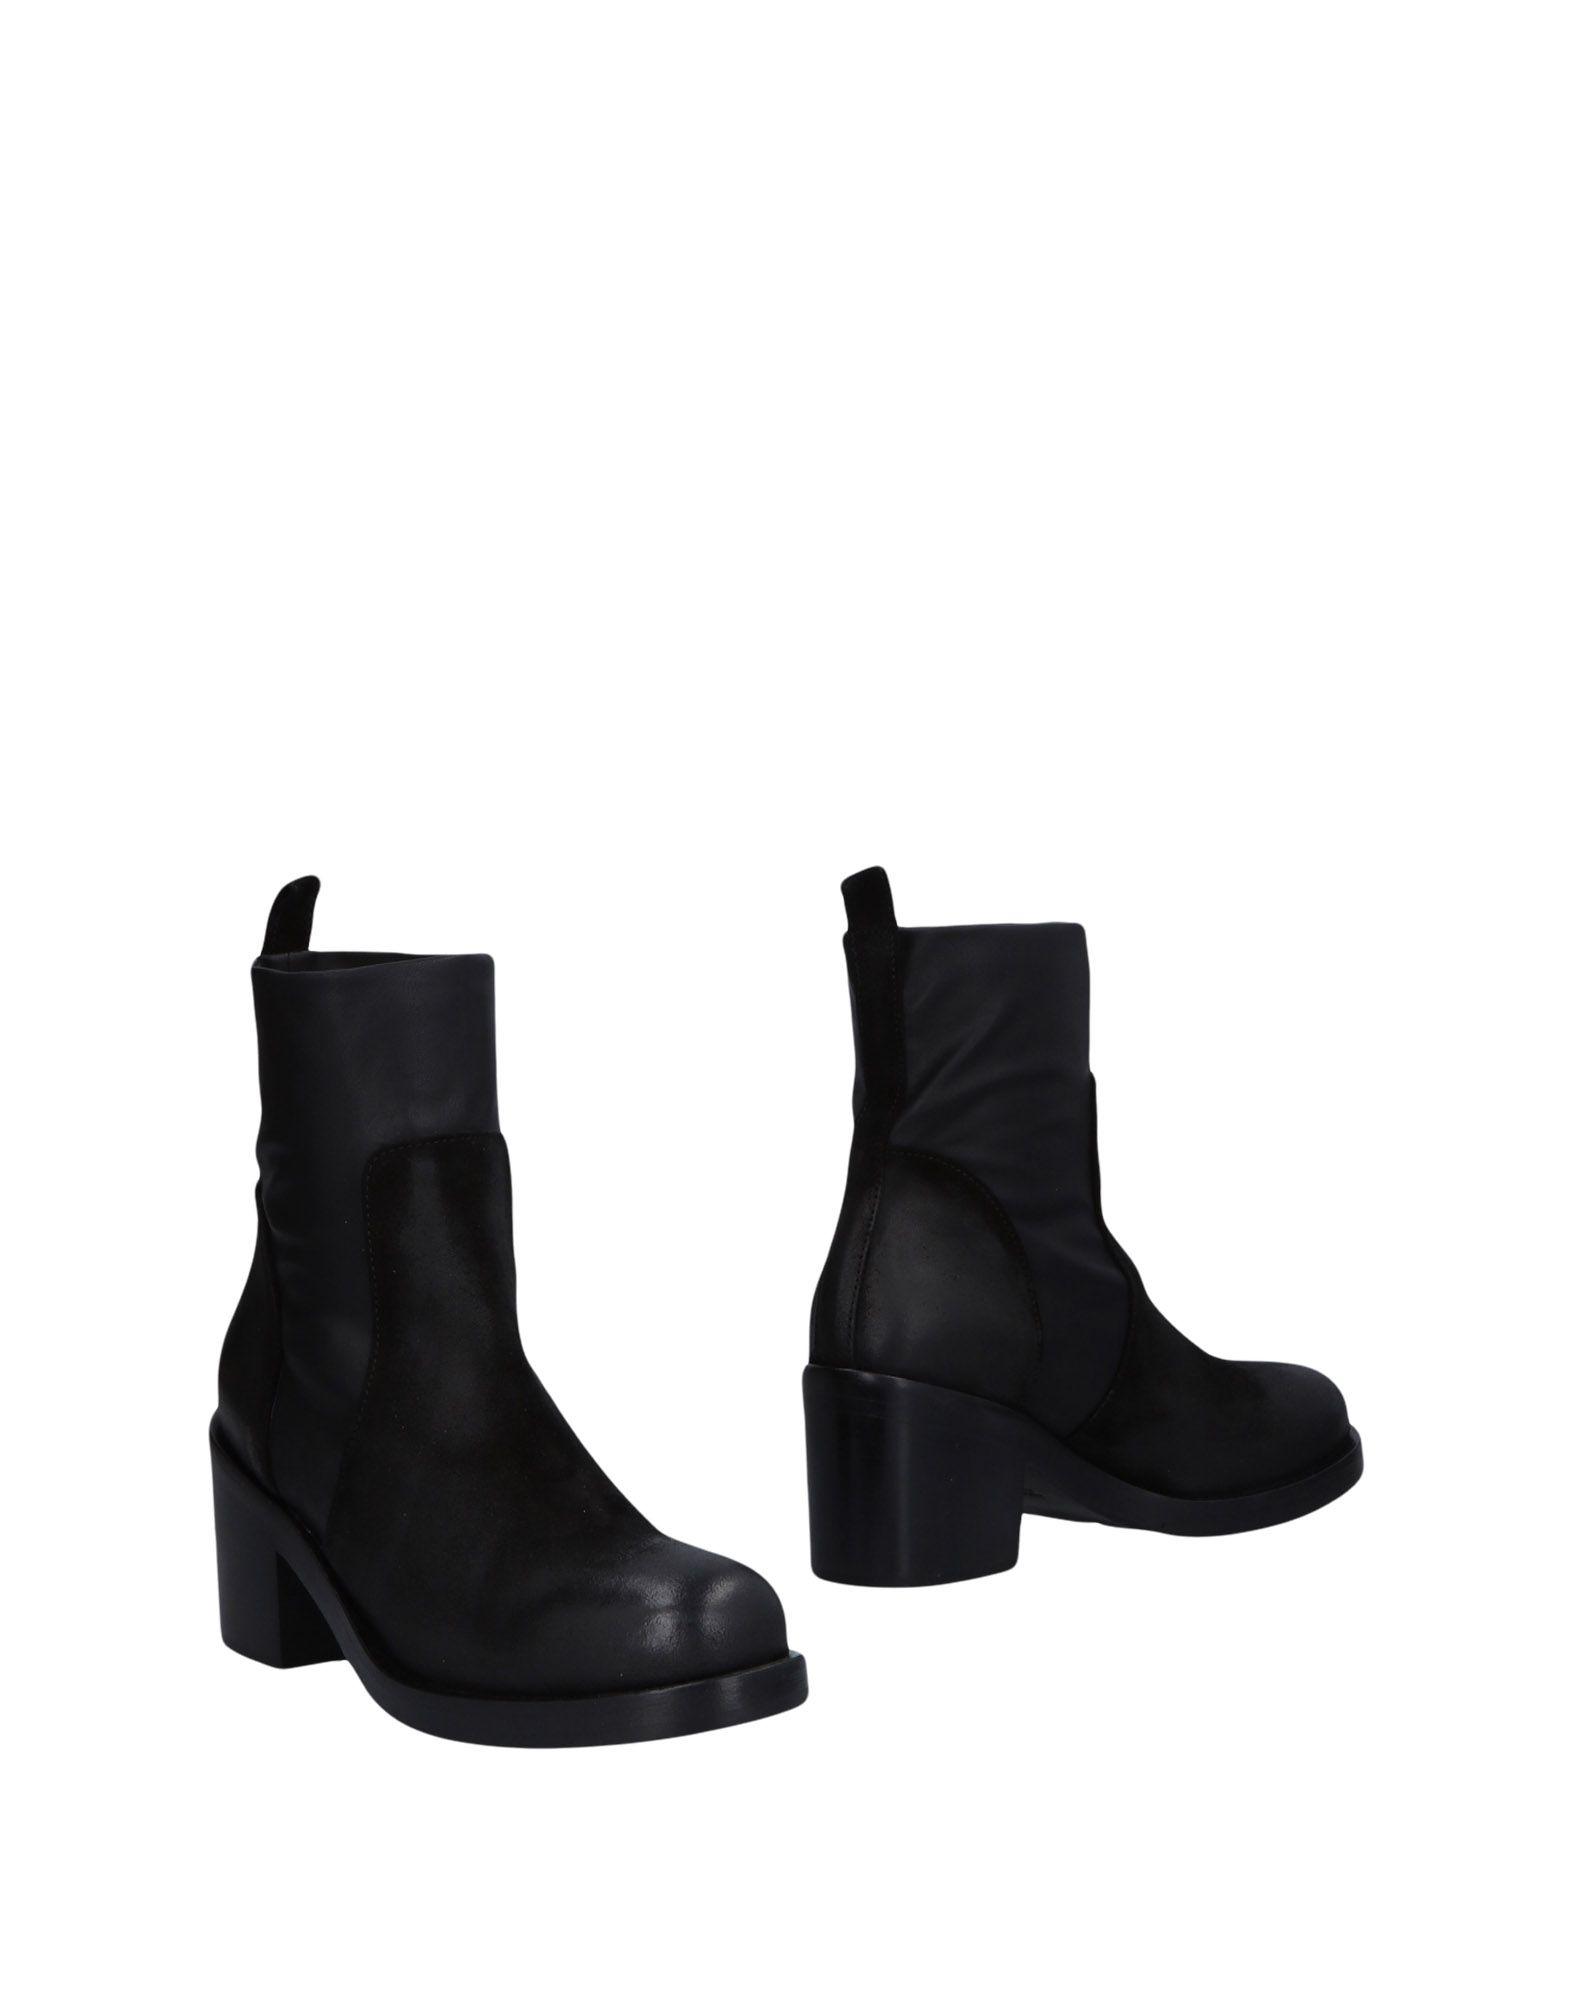 Stilvolle Strategia billige Schuhe Strategia Stilvolle Stiefelette Damen  11481767TP 44f36f